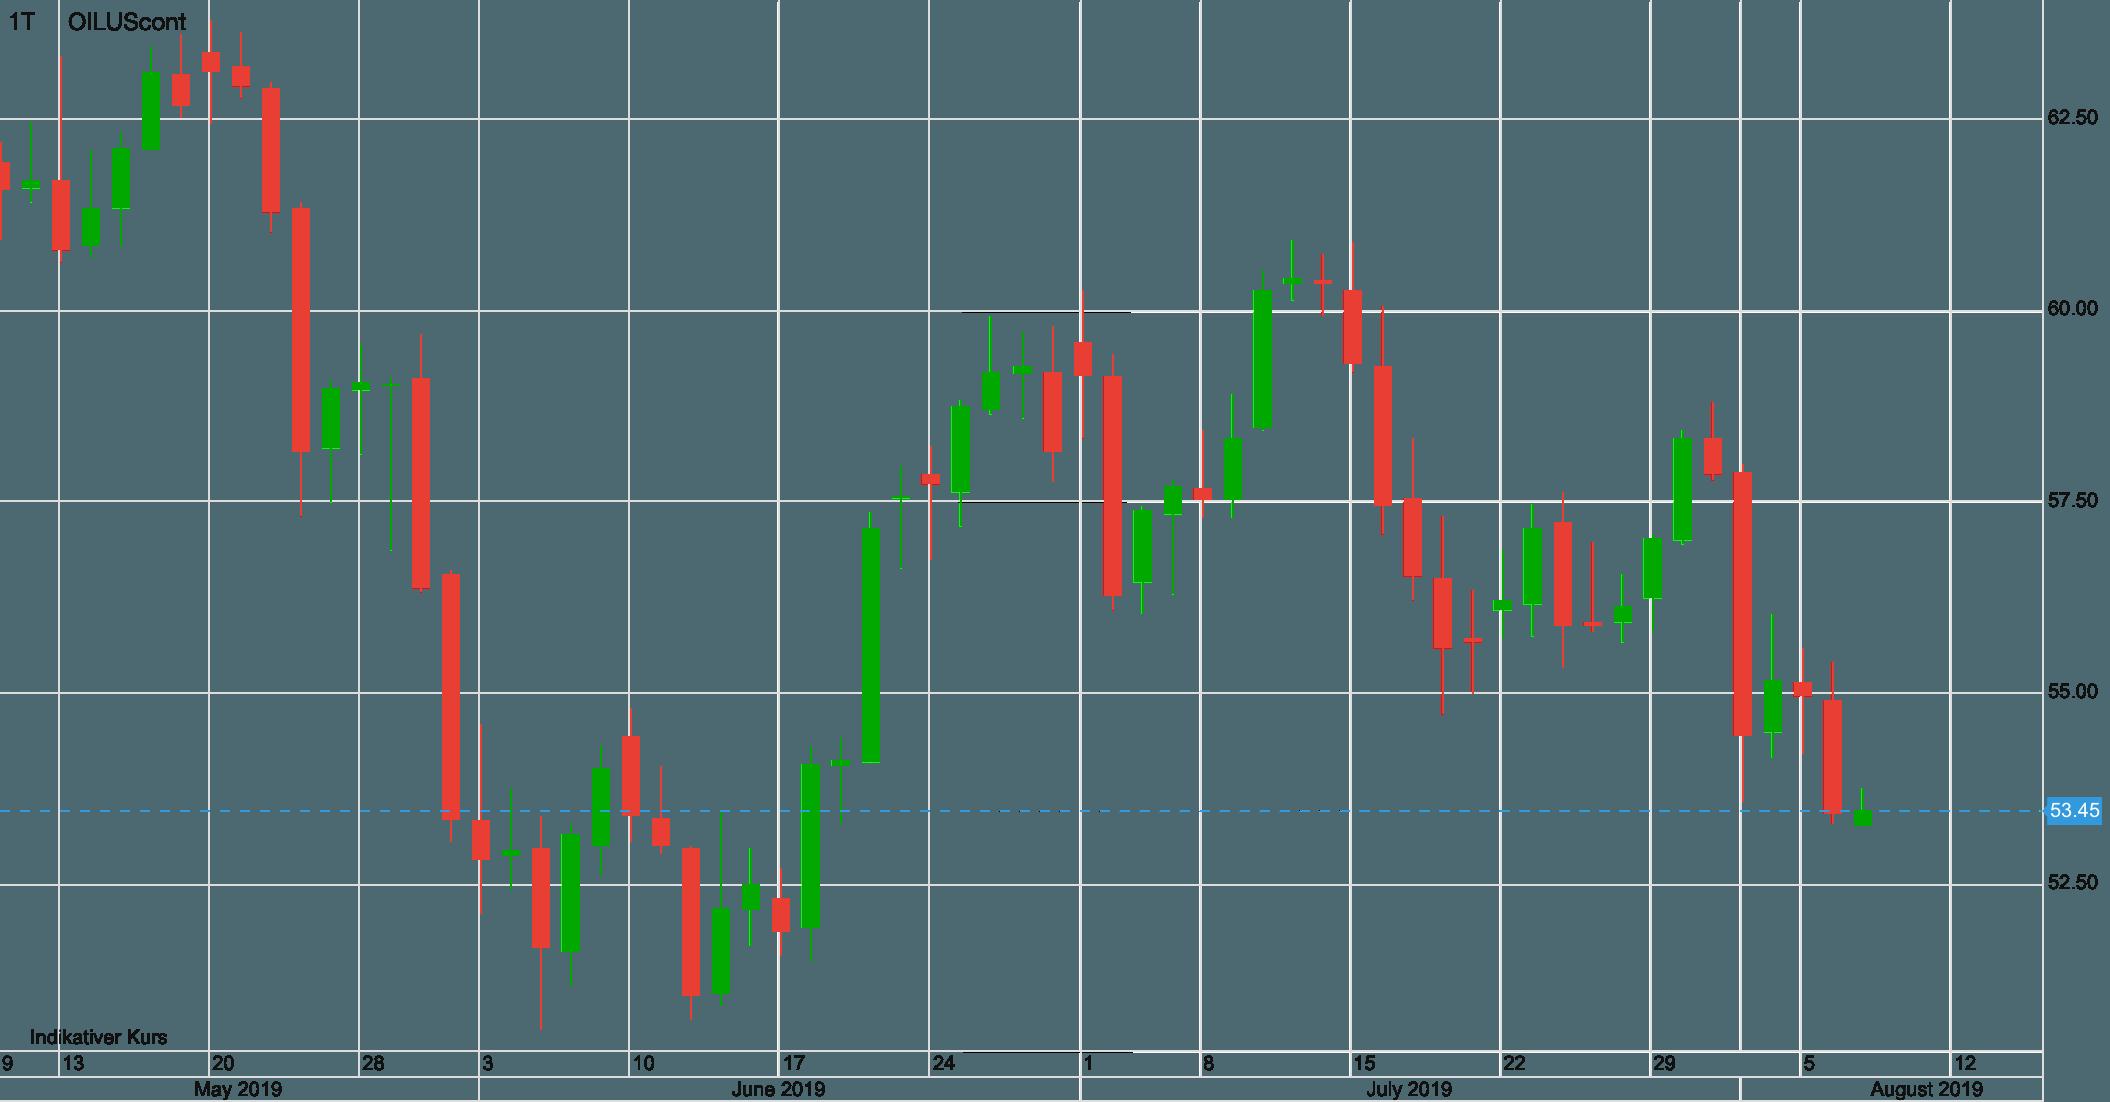 Ölpreis Verlauf seit Mai